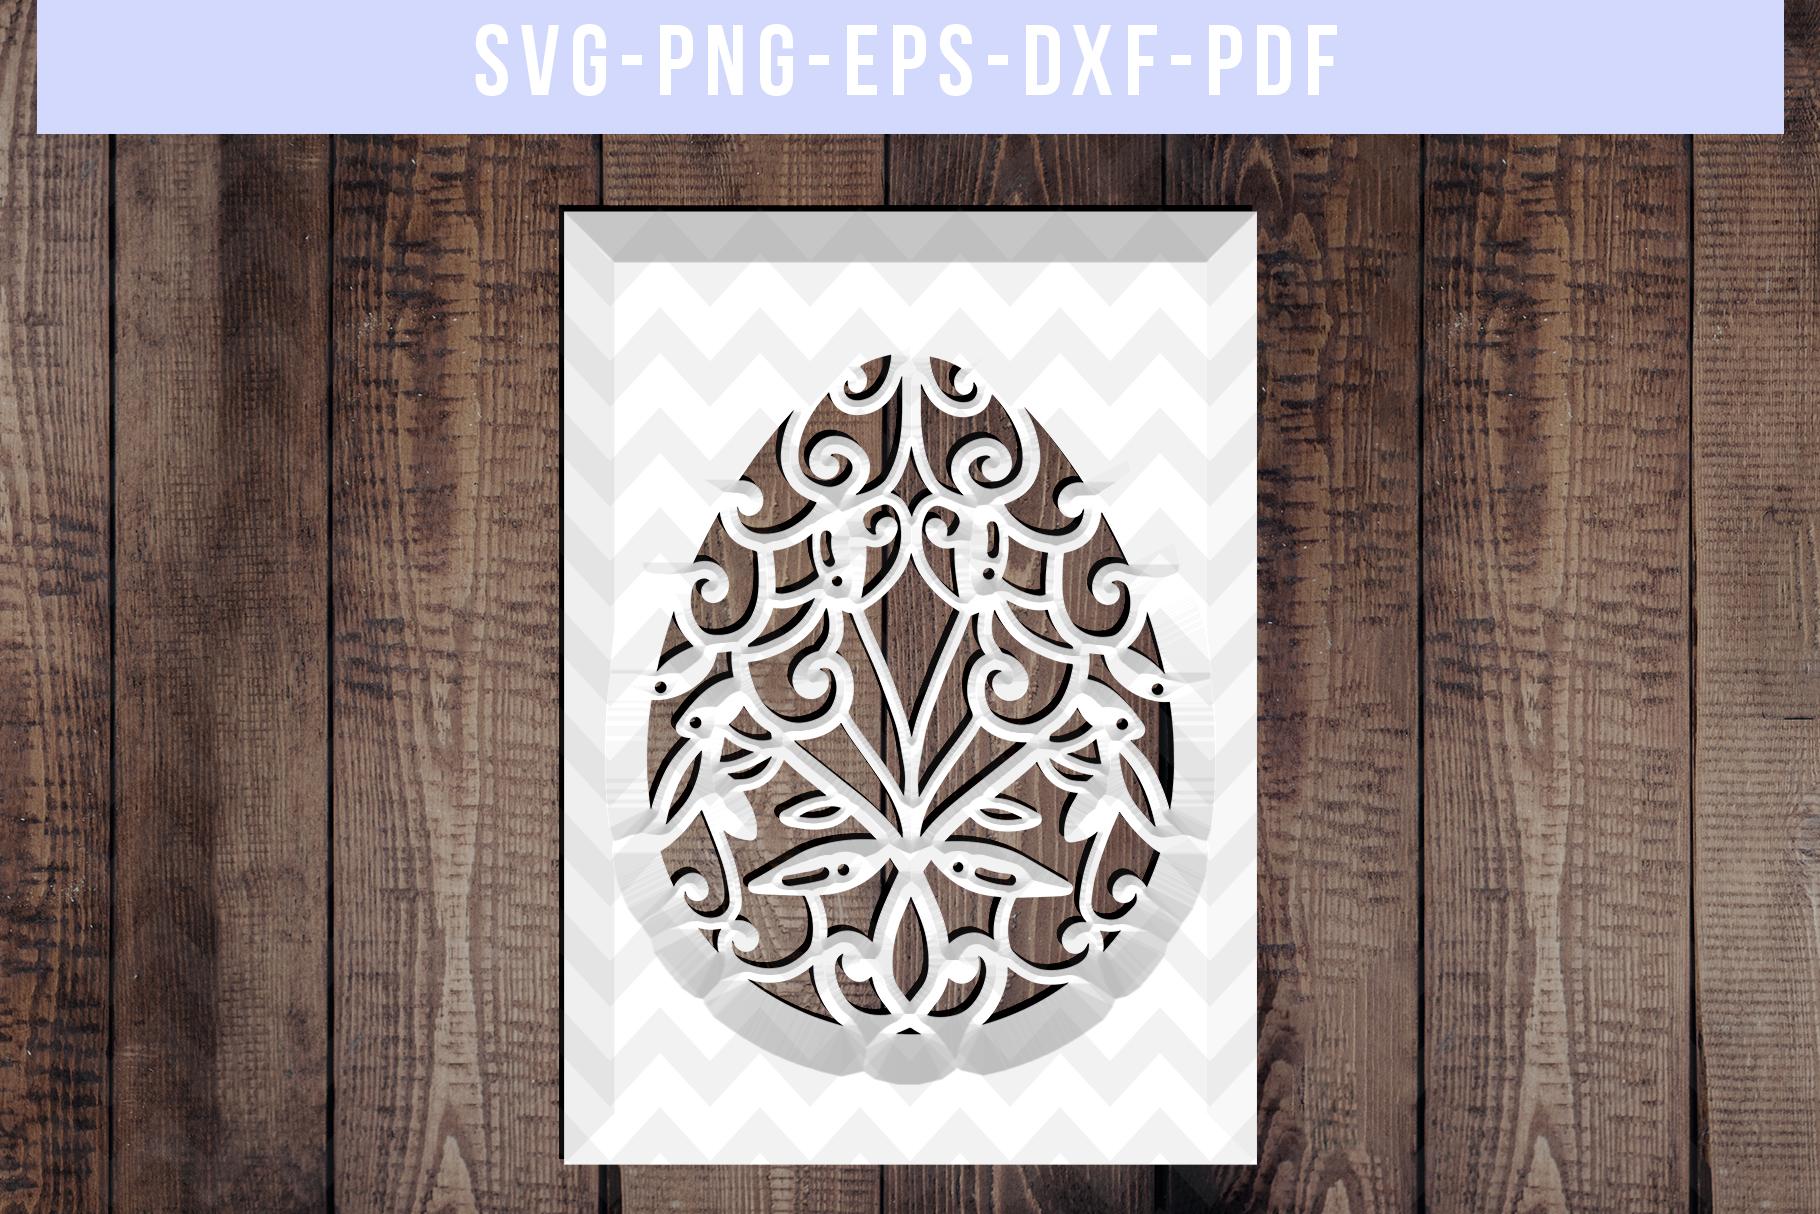 Easter Egg Frame Papercut Template, Metal Decor, SVG, PDF example image 3